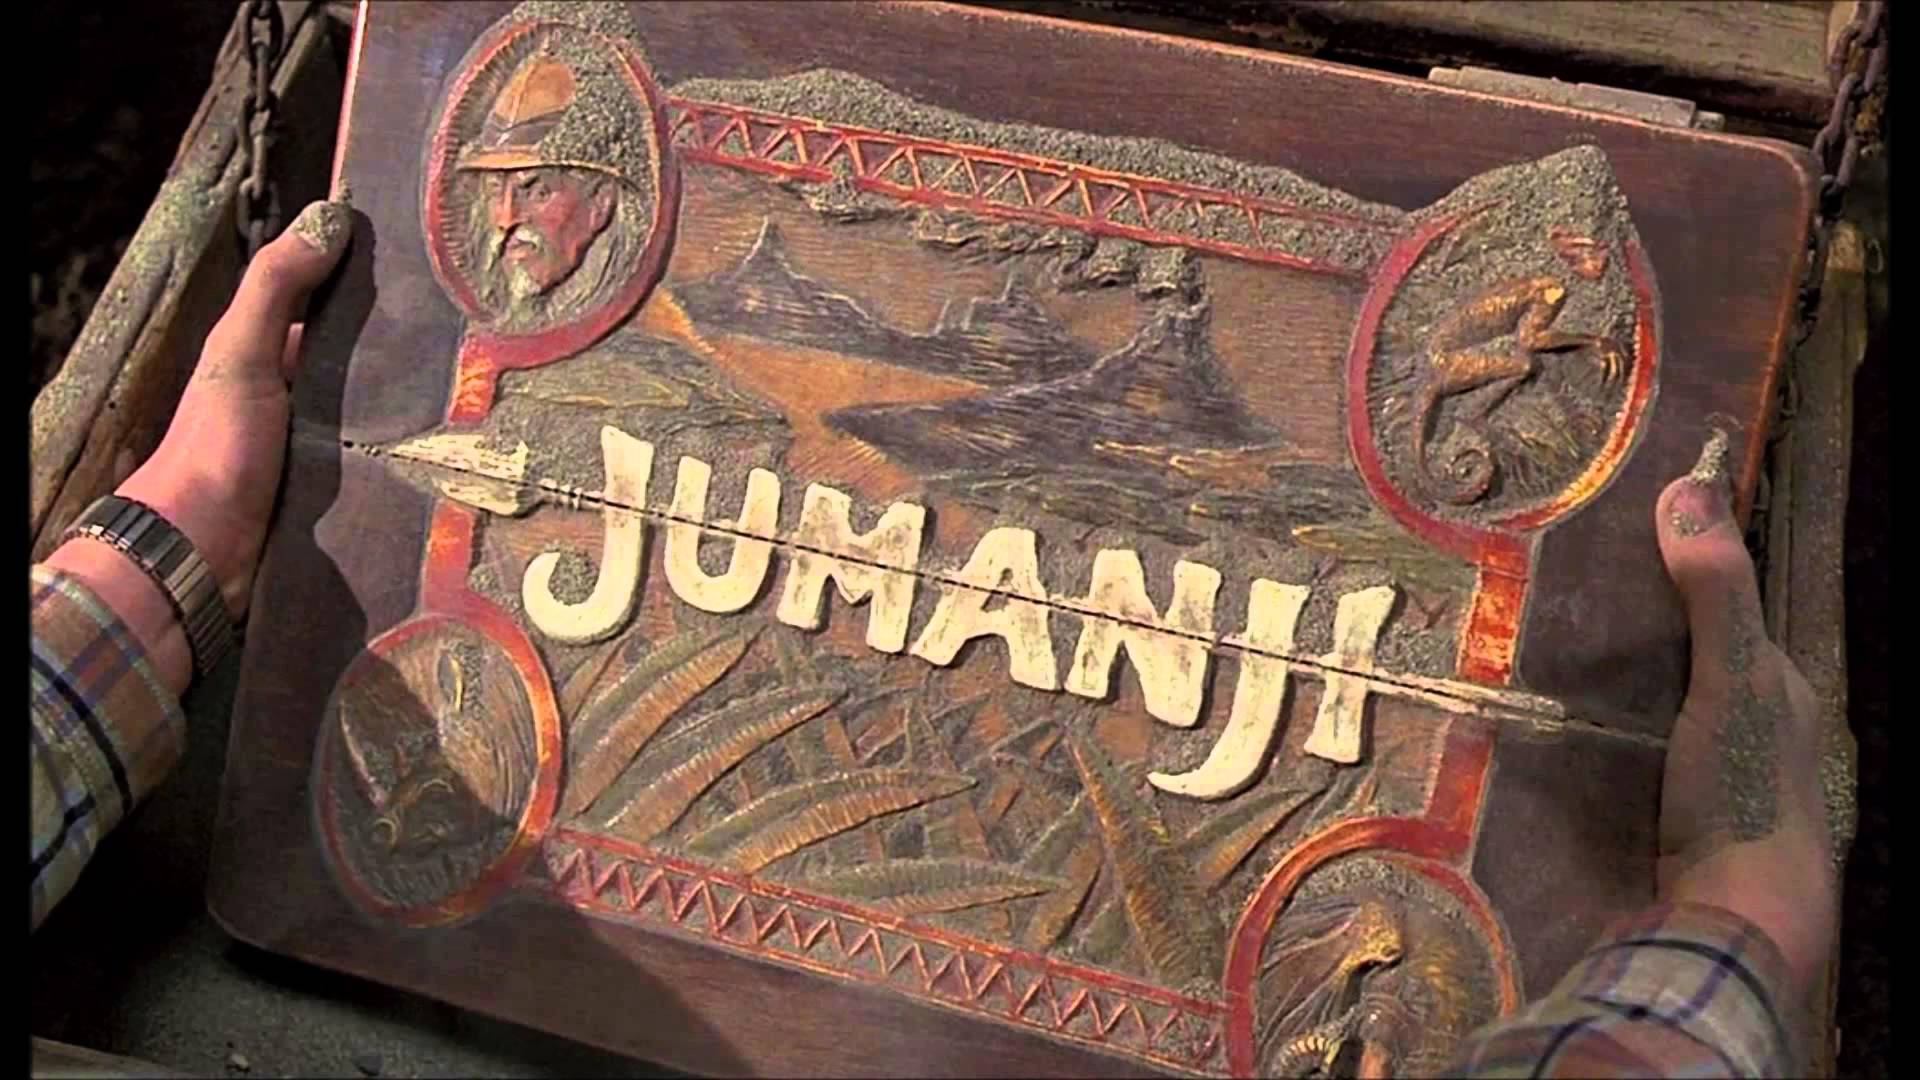 jumanji-jumonki-bar-monkey-shoulder-folkr-cover-blog-mode-news-01